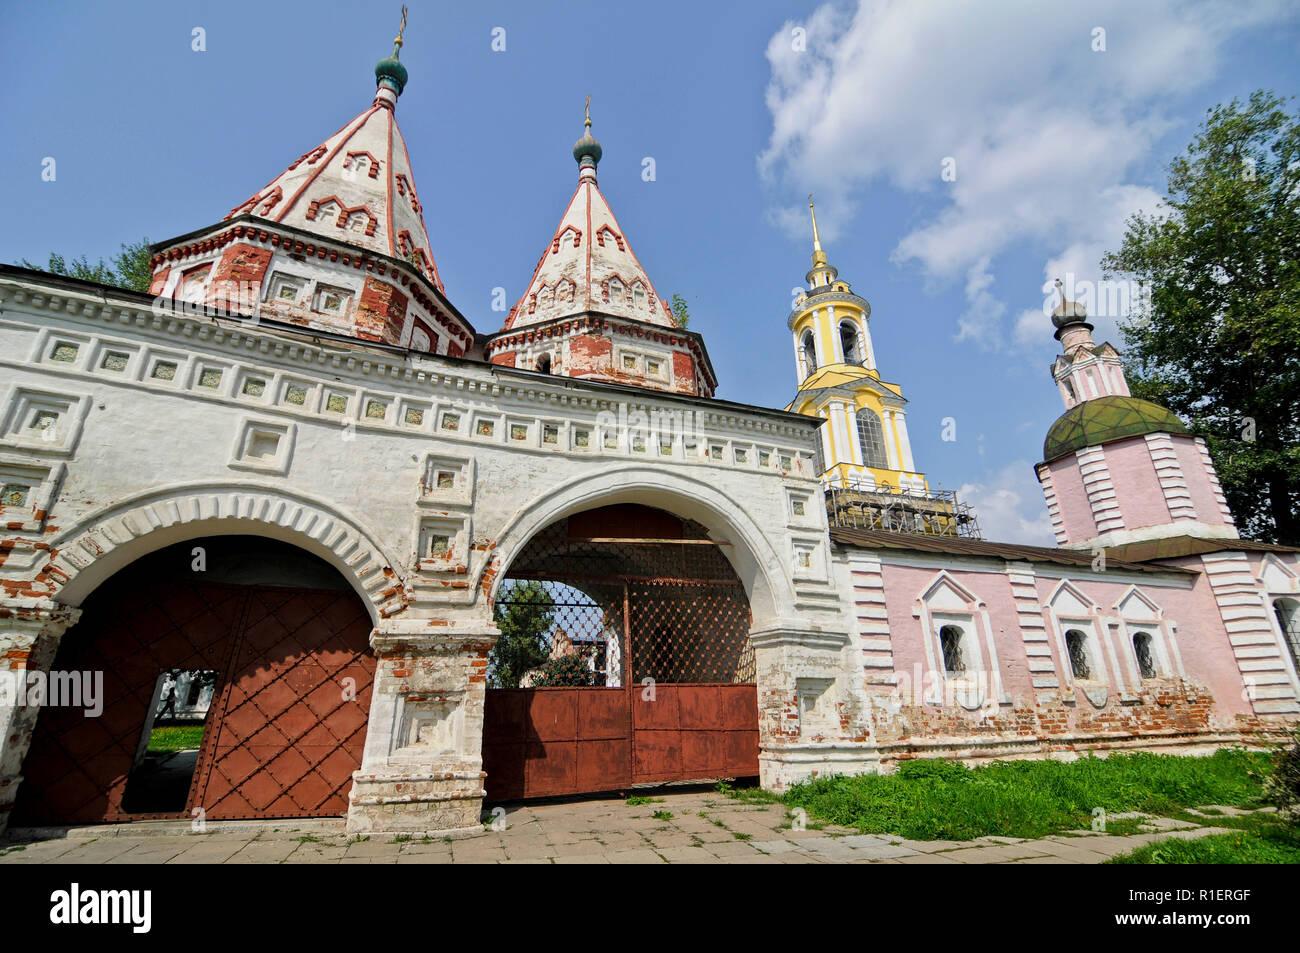 Rizopolozhensky ('Deposition der Robe') Kloster, Wladimir, Russland Stockbild